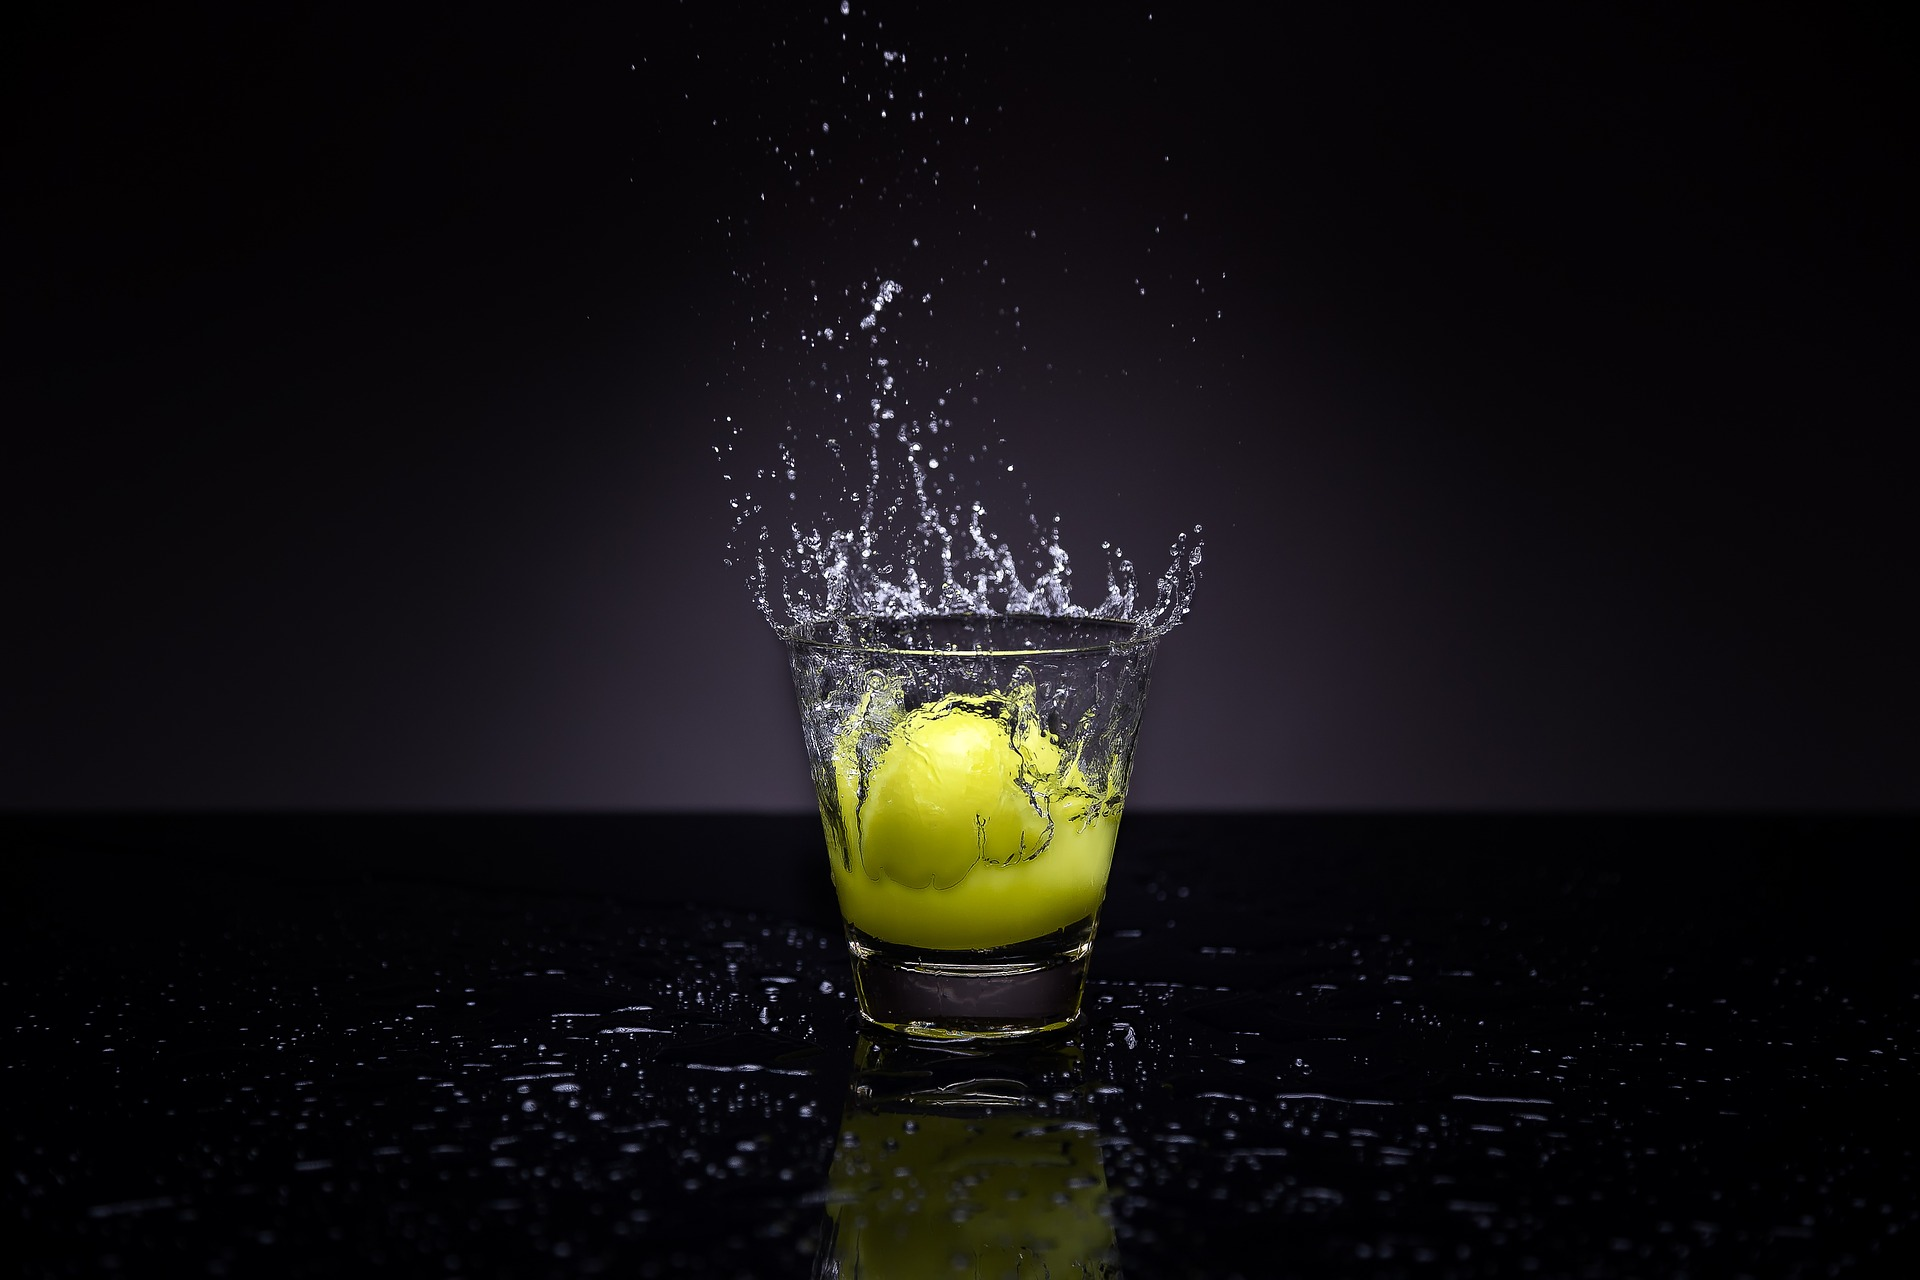 agua, vaso, limón, gotas, salpicadura - Fondos de Pantalla HD - professor-falken.com